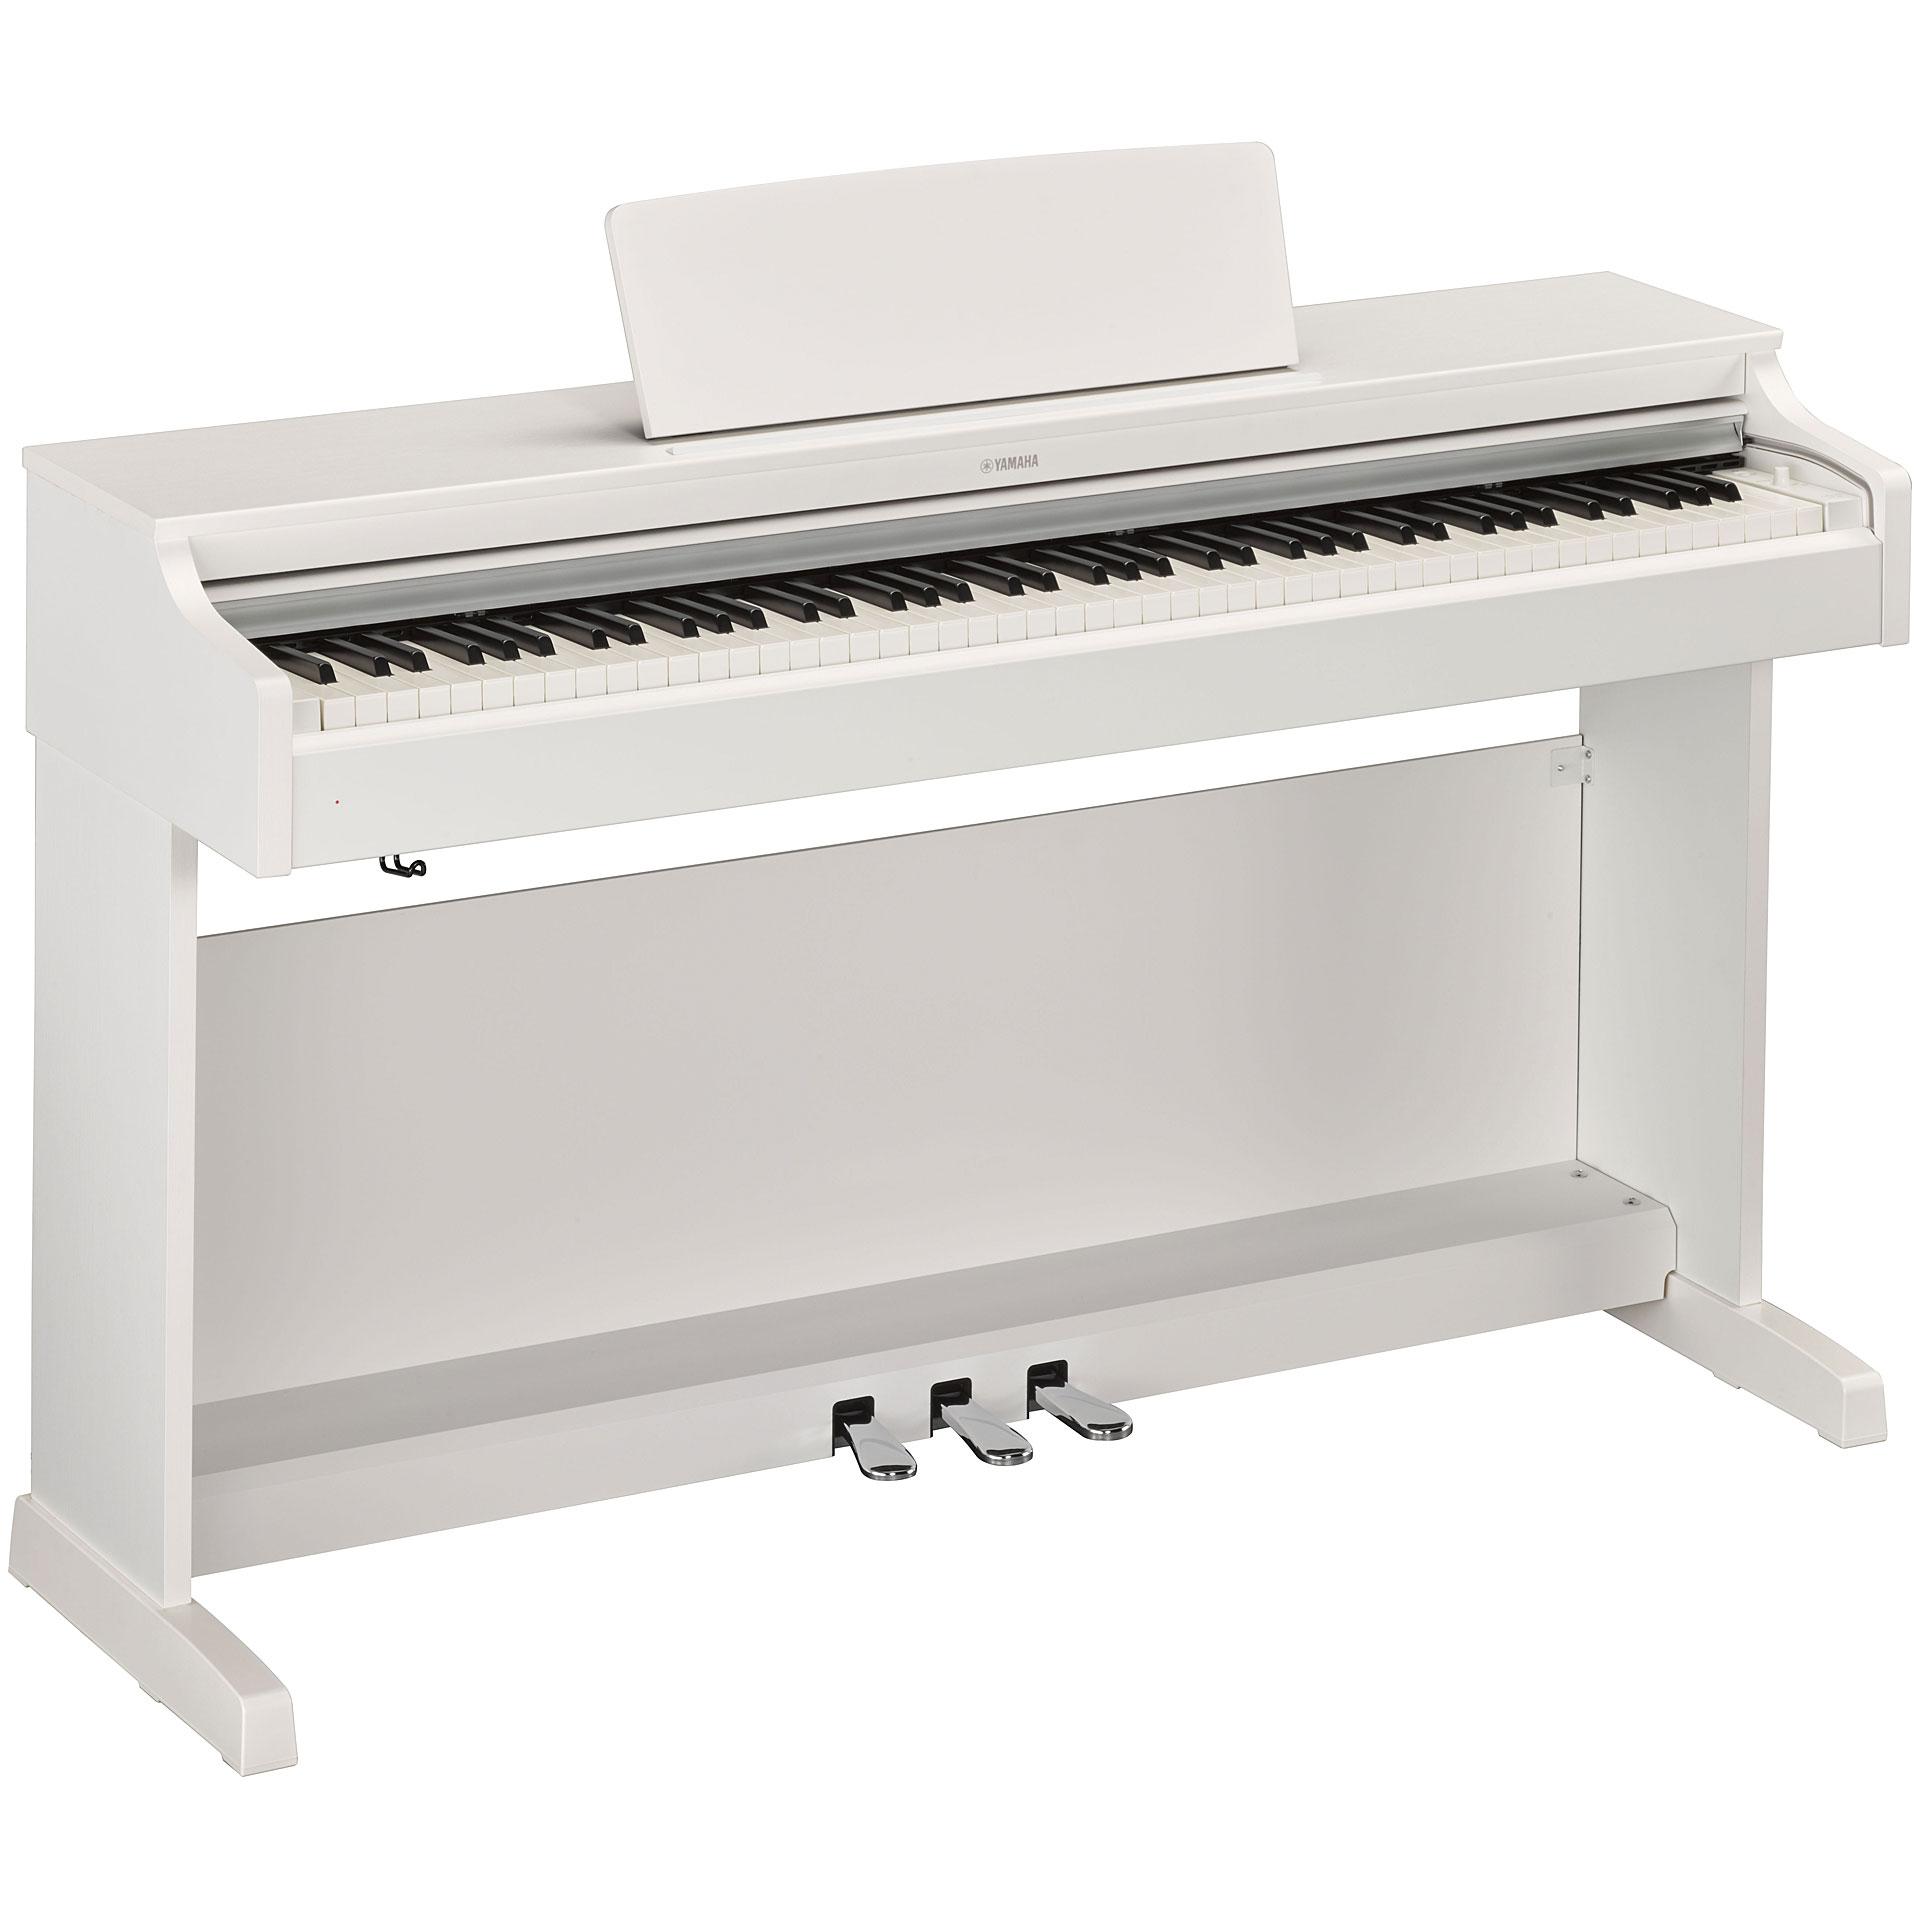 Yamaha arius ydp 163 wh pianoforte digitale for Yamaha arius 163